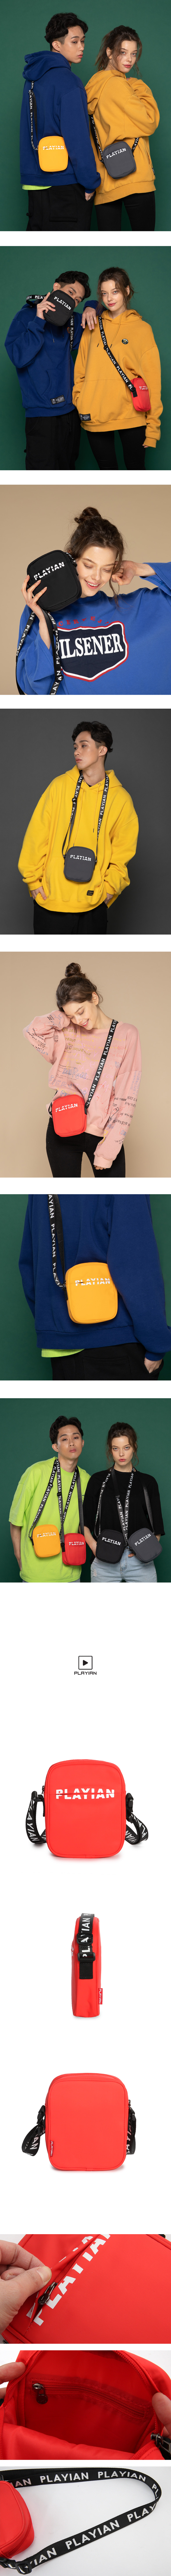 Dixter mini cross bag_딕스터 미니크로스백(EMC06URED)